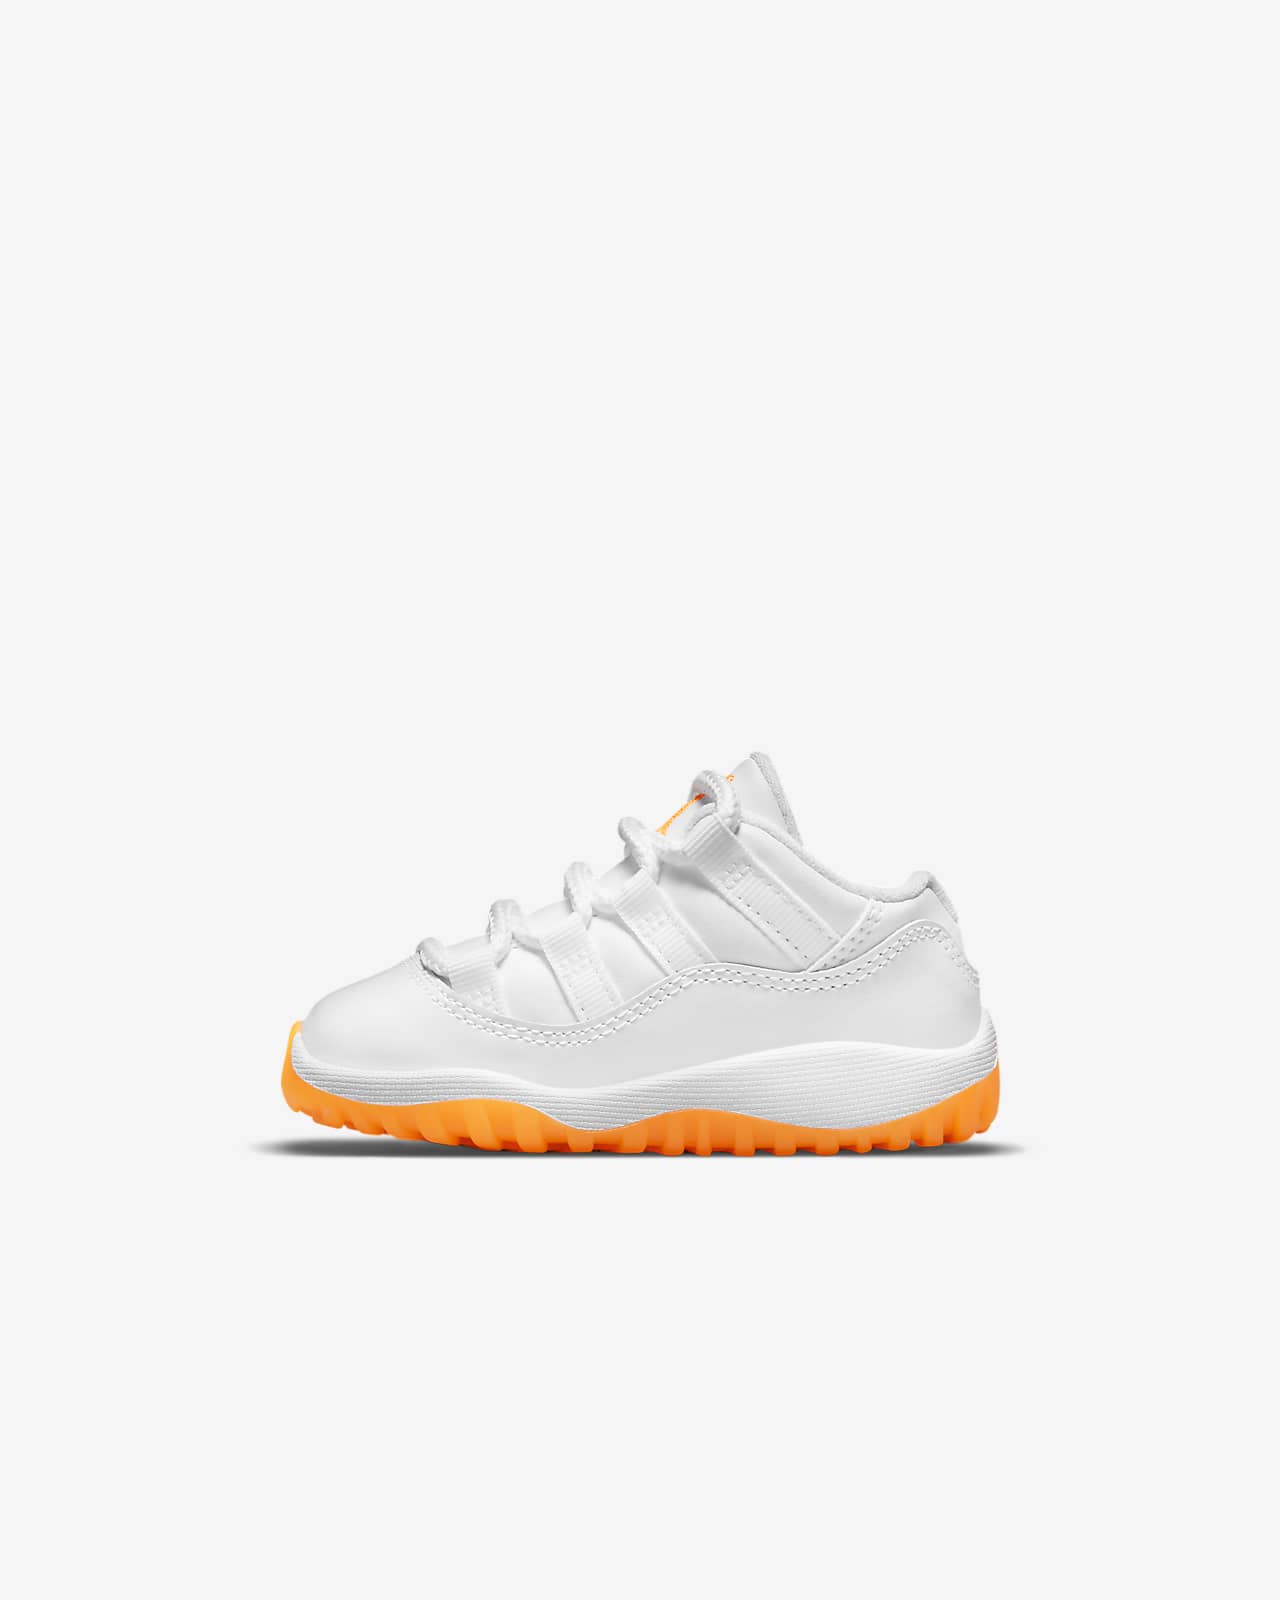 Jordan 11 Retro Low Infant/Toddler Shoe